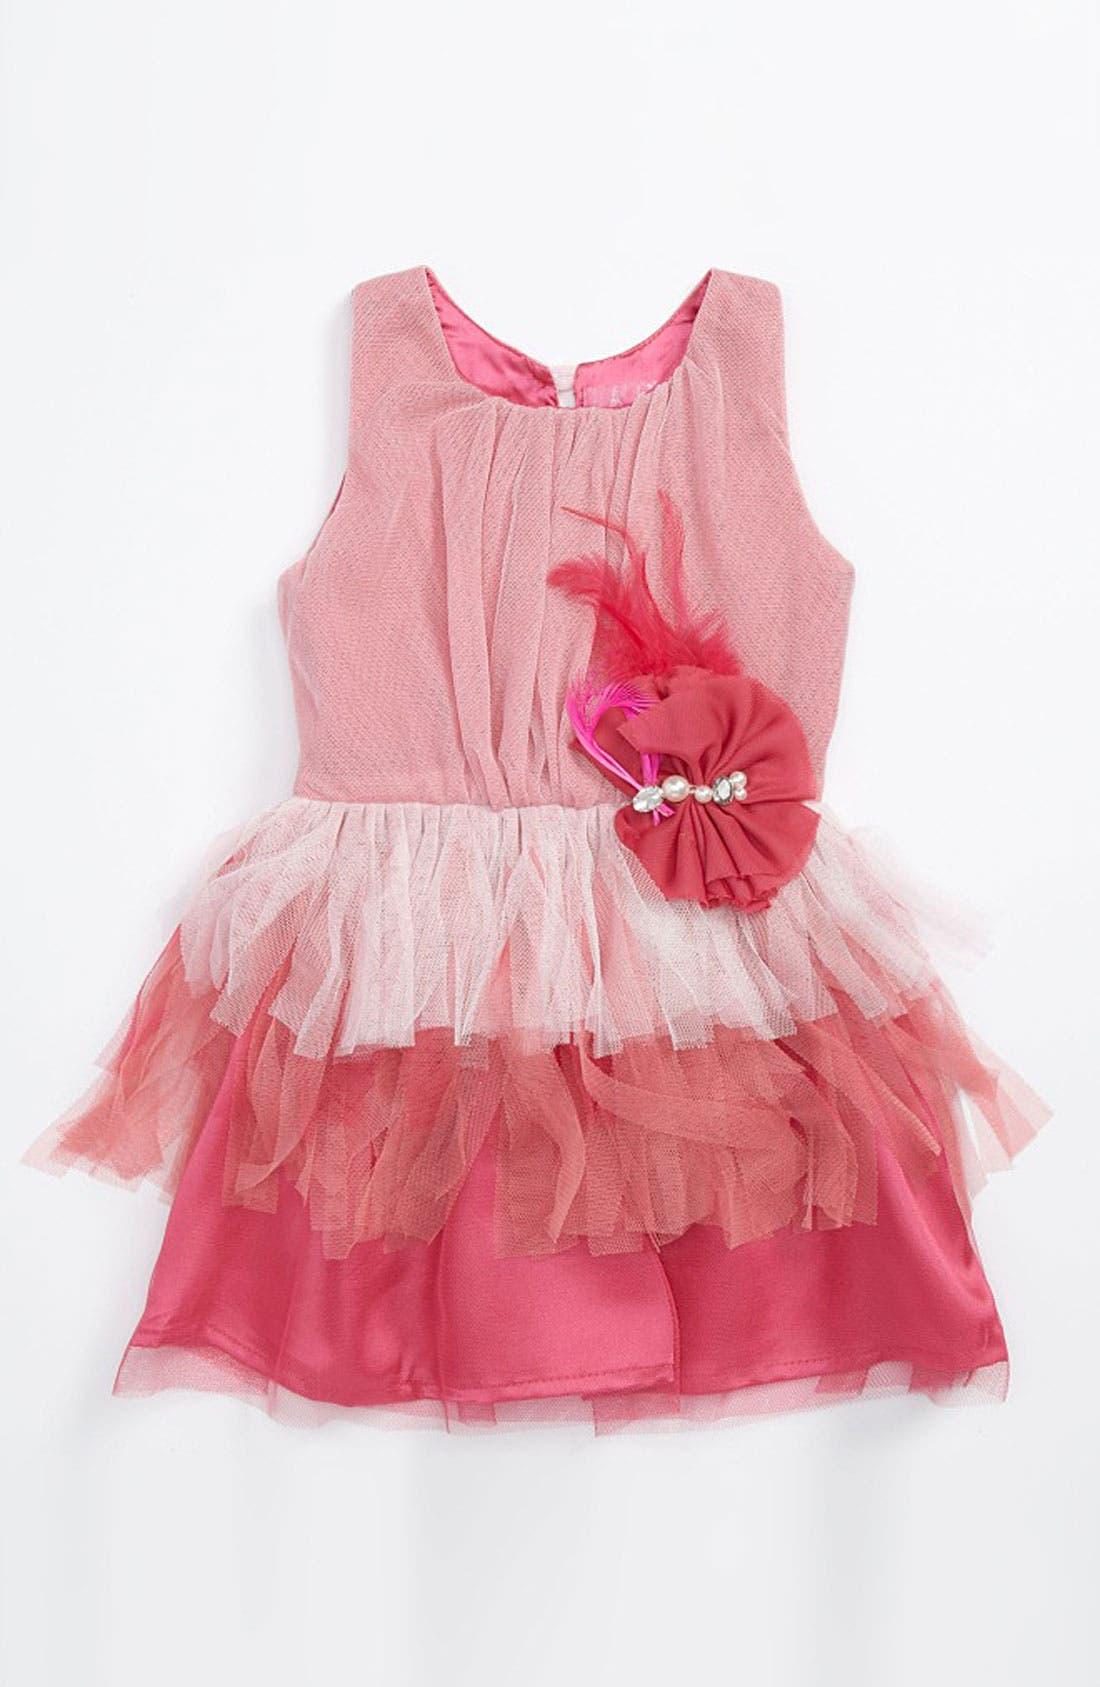 Main Image - Le Pink 'Valentina' Dress (Toddler)